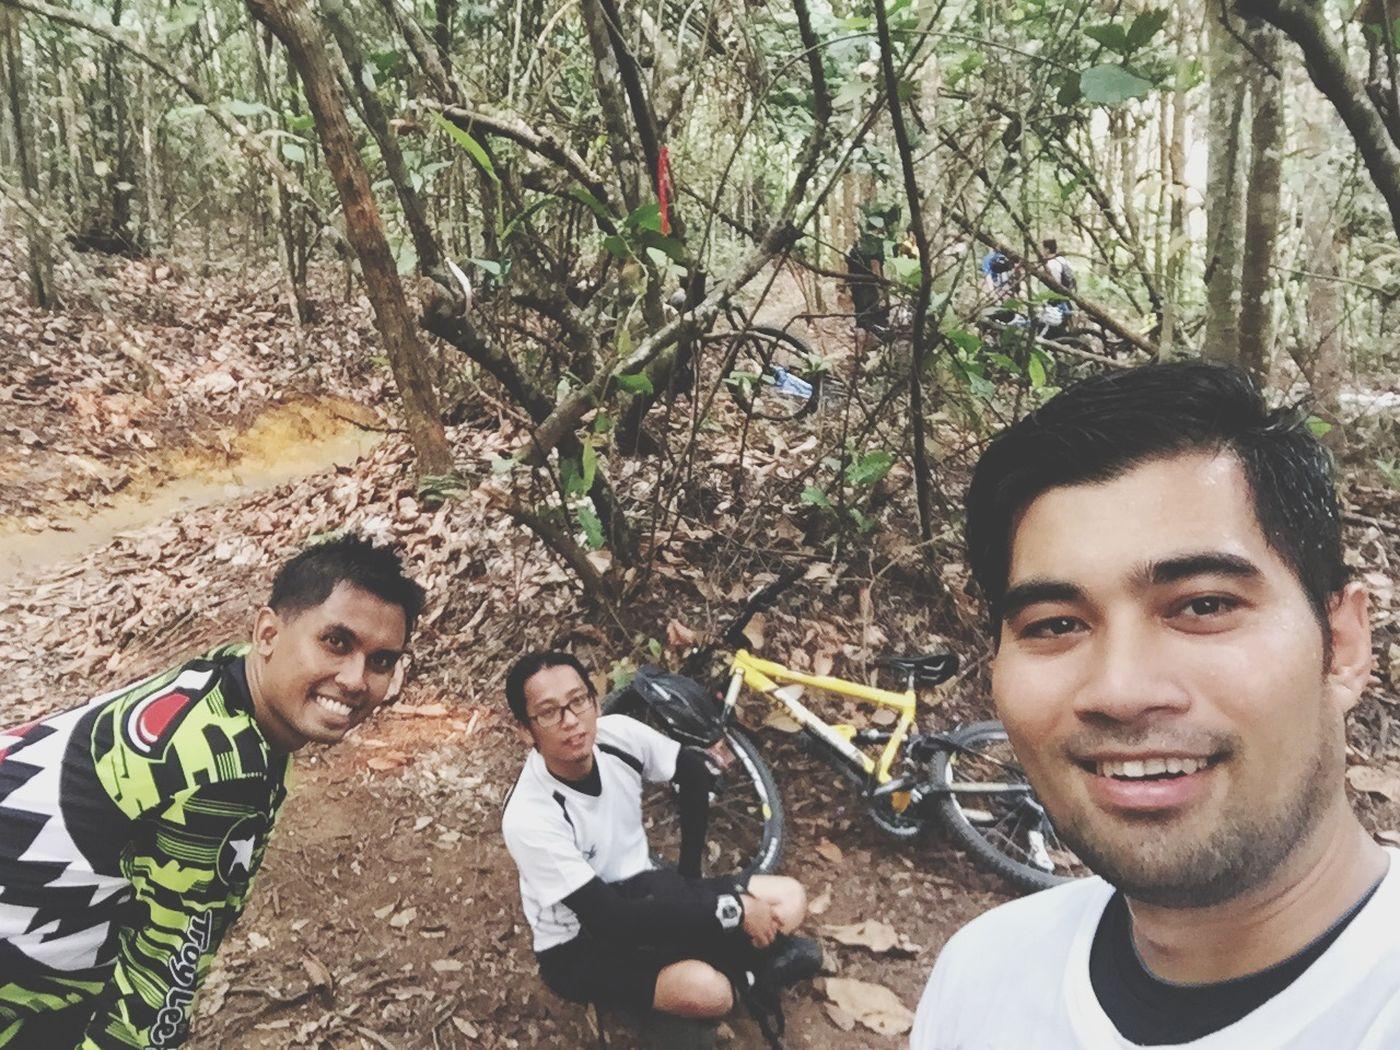 Mountainbiking through beautiful Nature with Friends